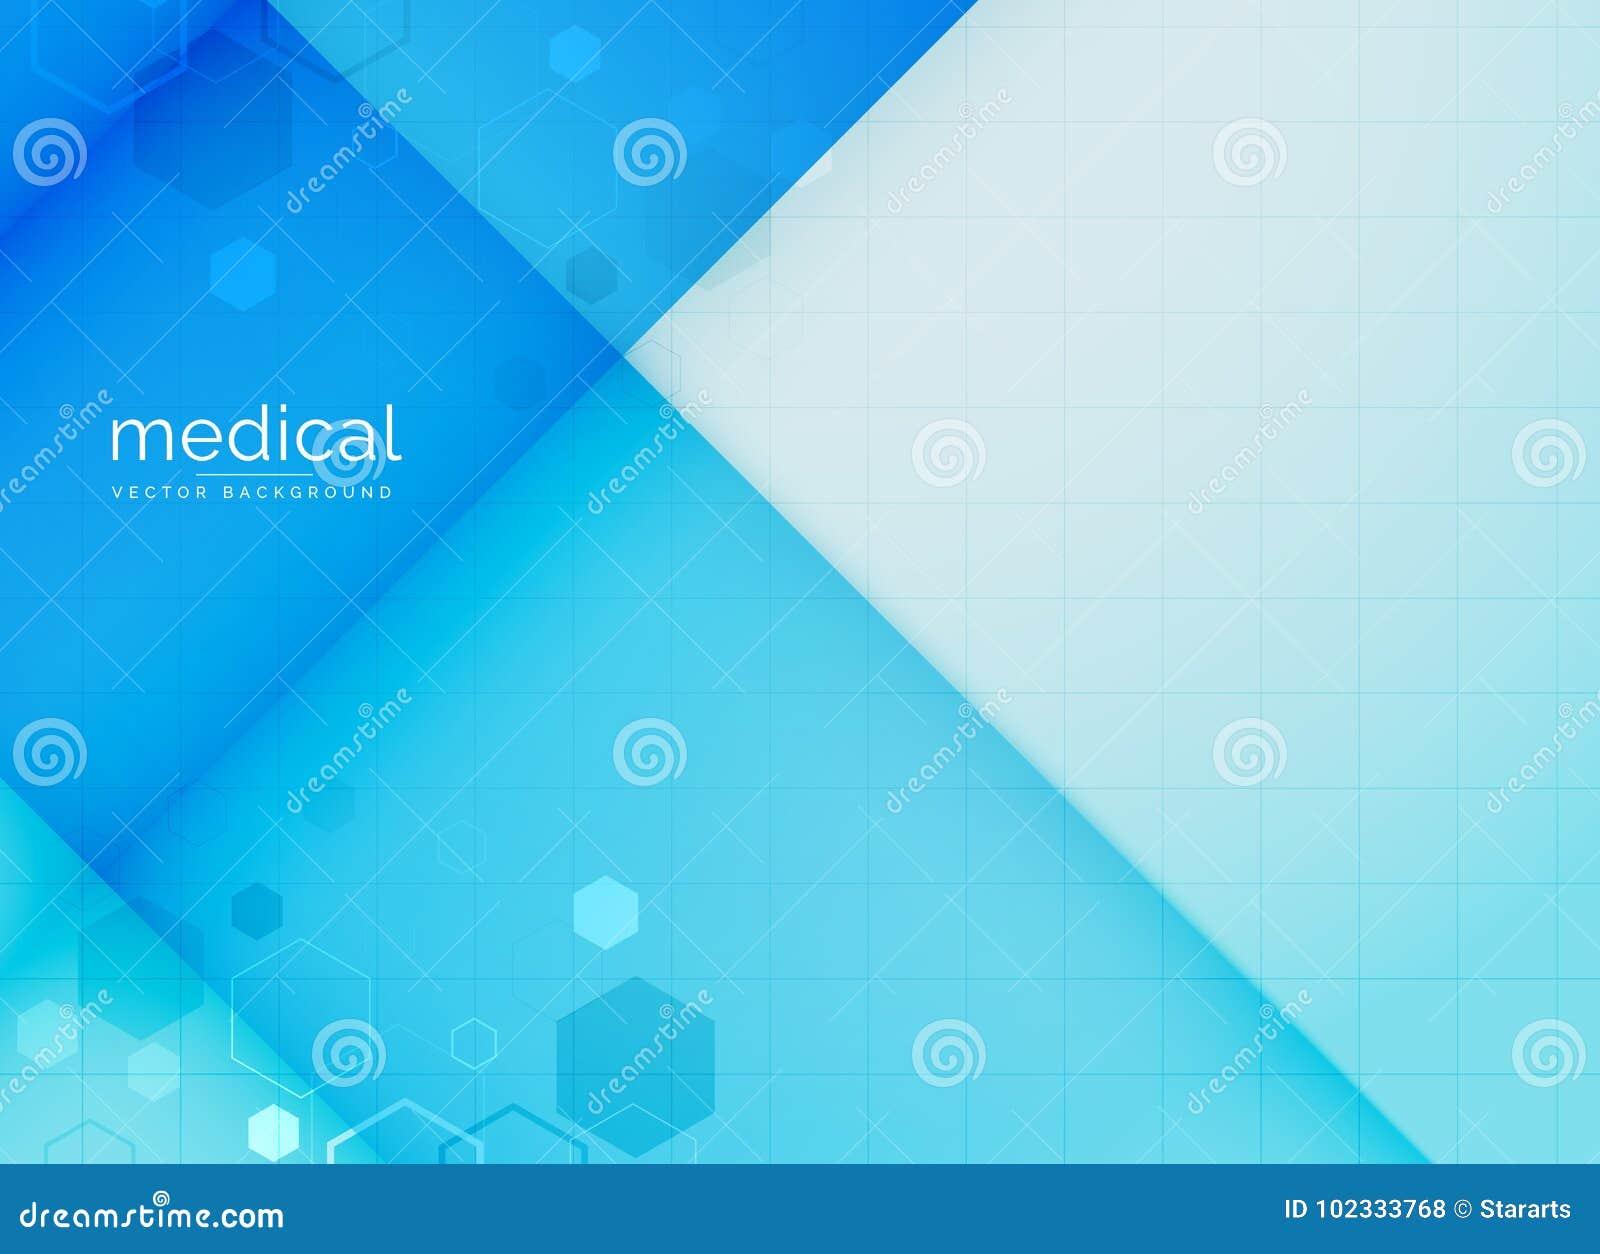 Abstracte medische achtergrond in blauwe kleur